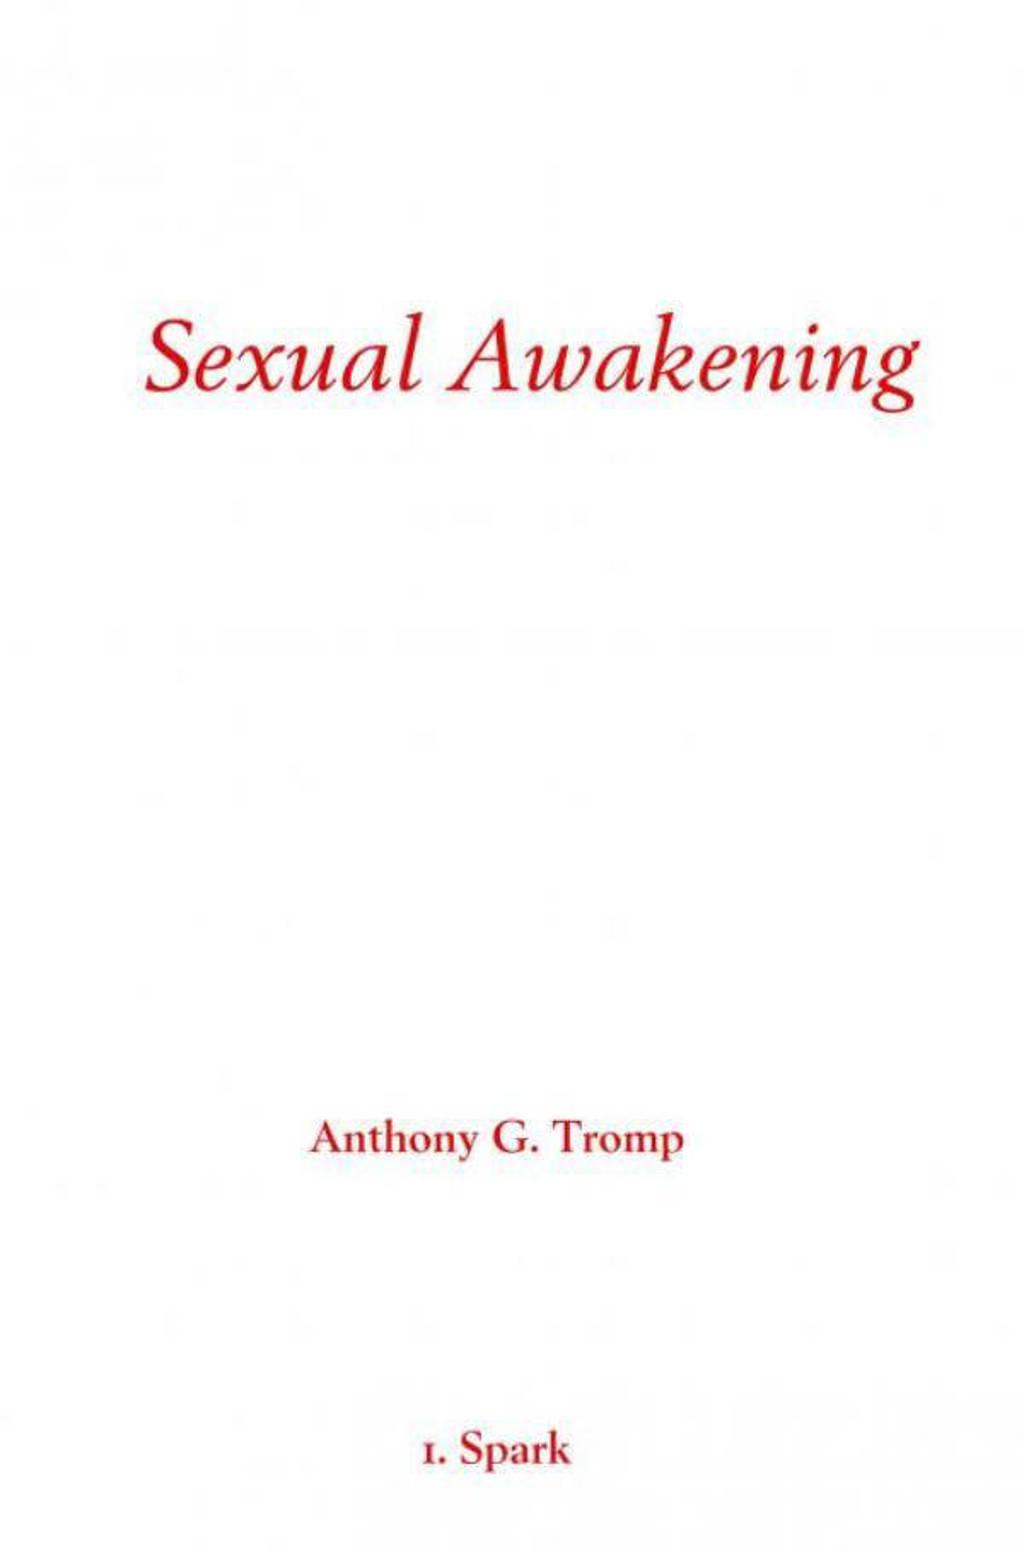 Sexual Awakening - Anthony G. Tromp